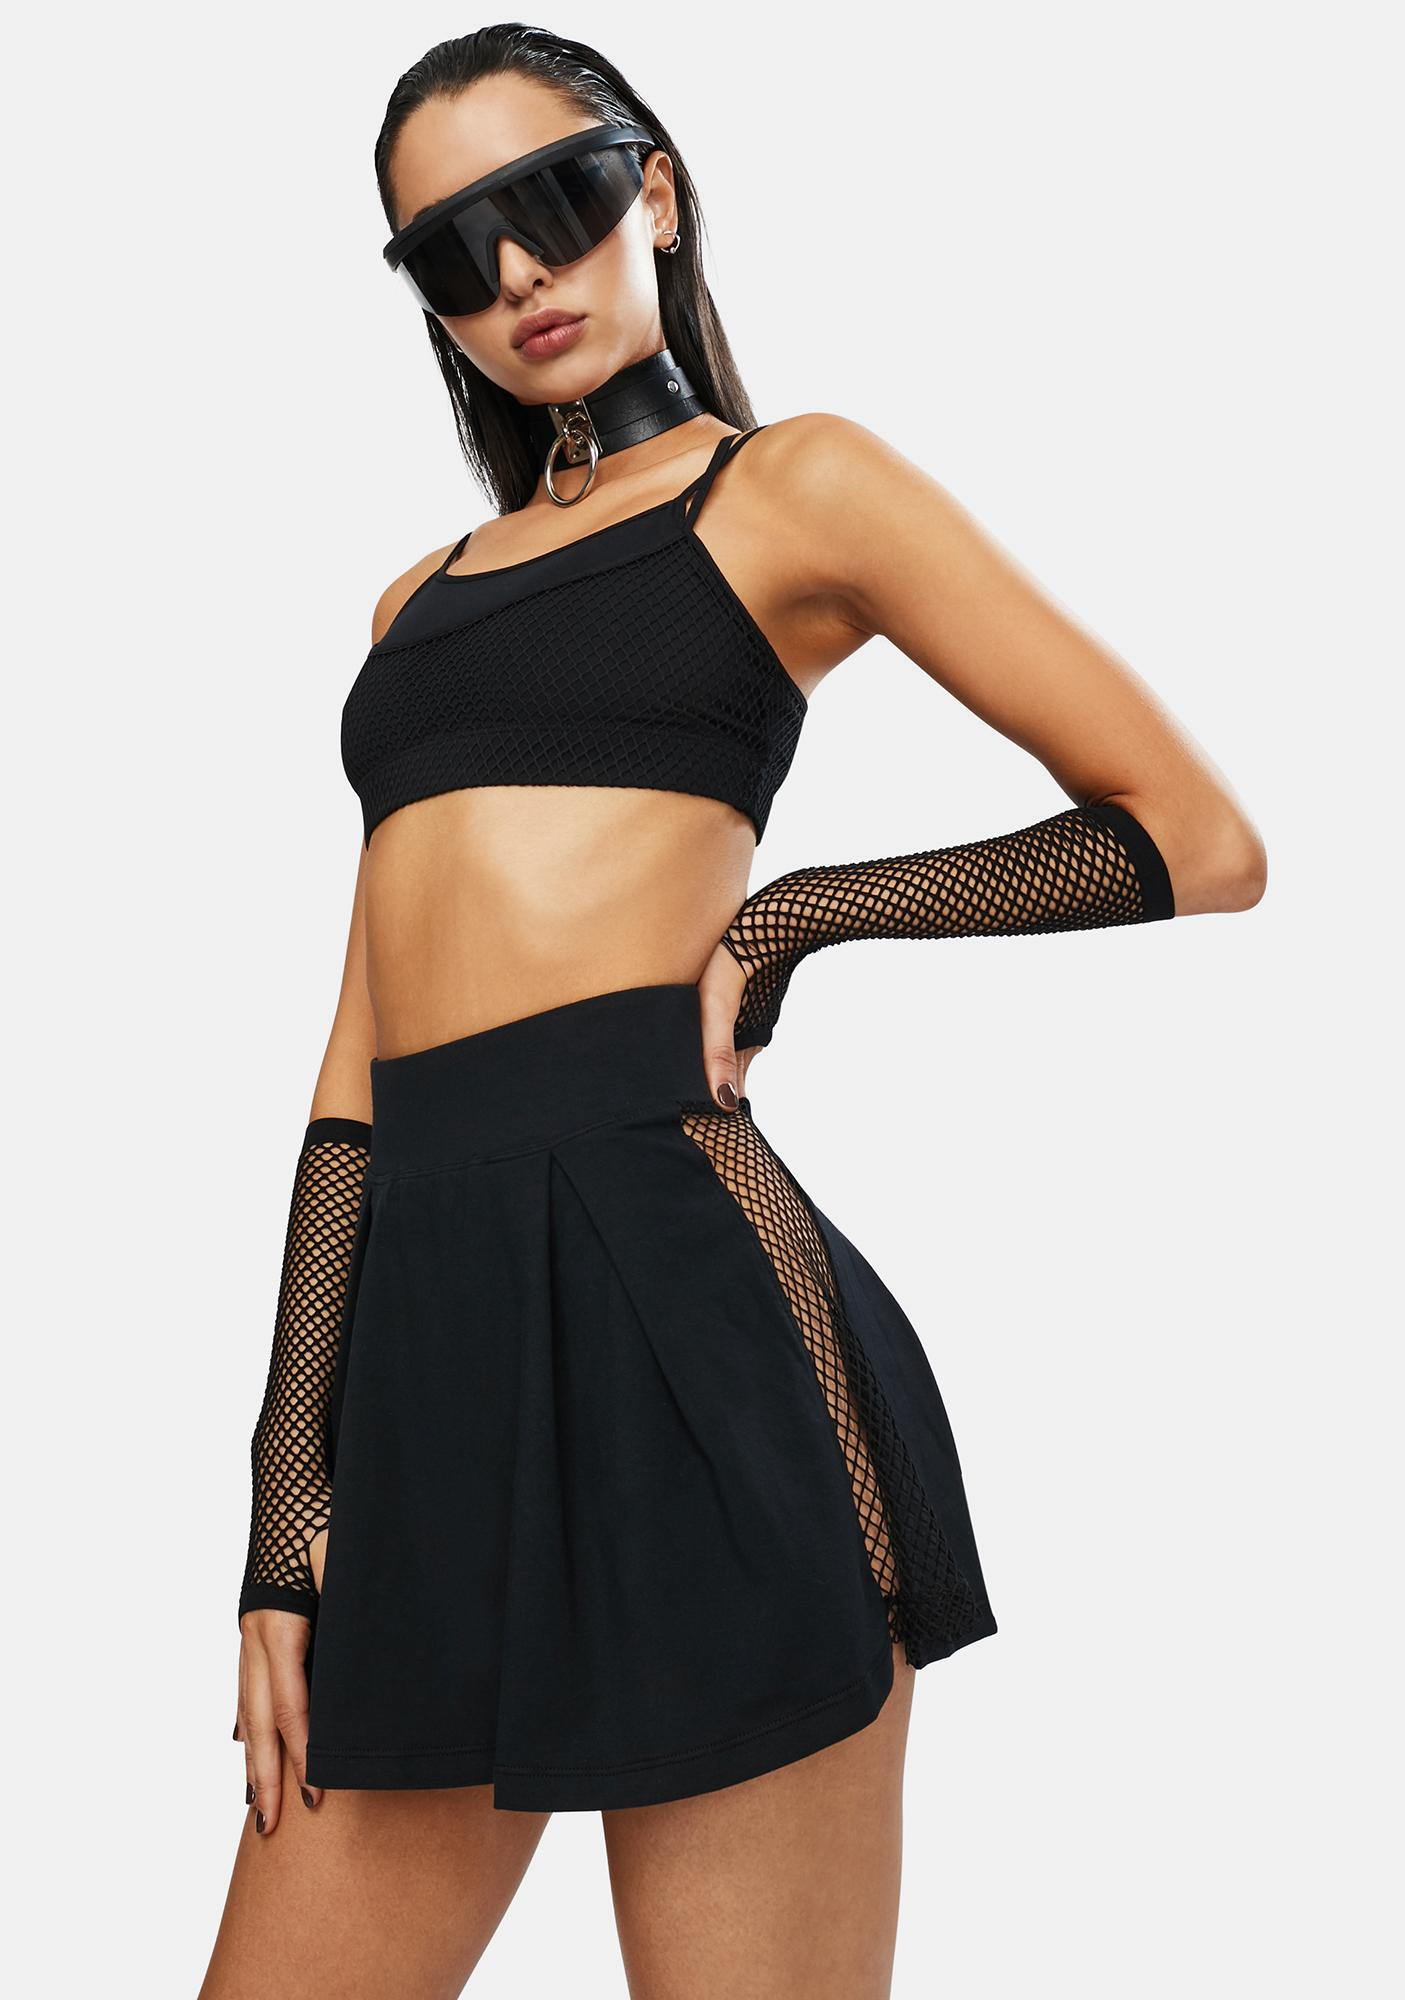 Club Exx Serve It Up Fishnet Tennis Skirt